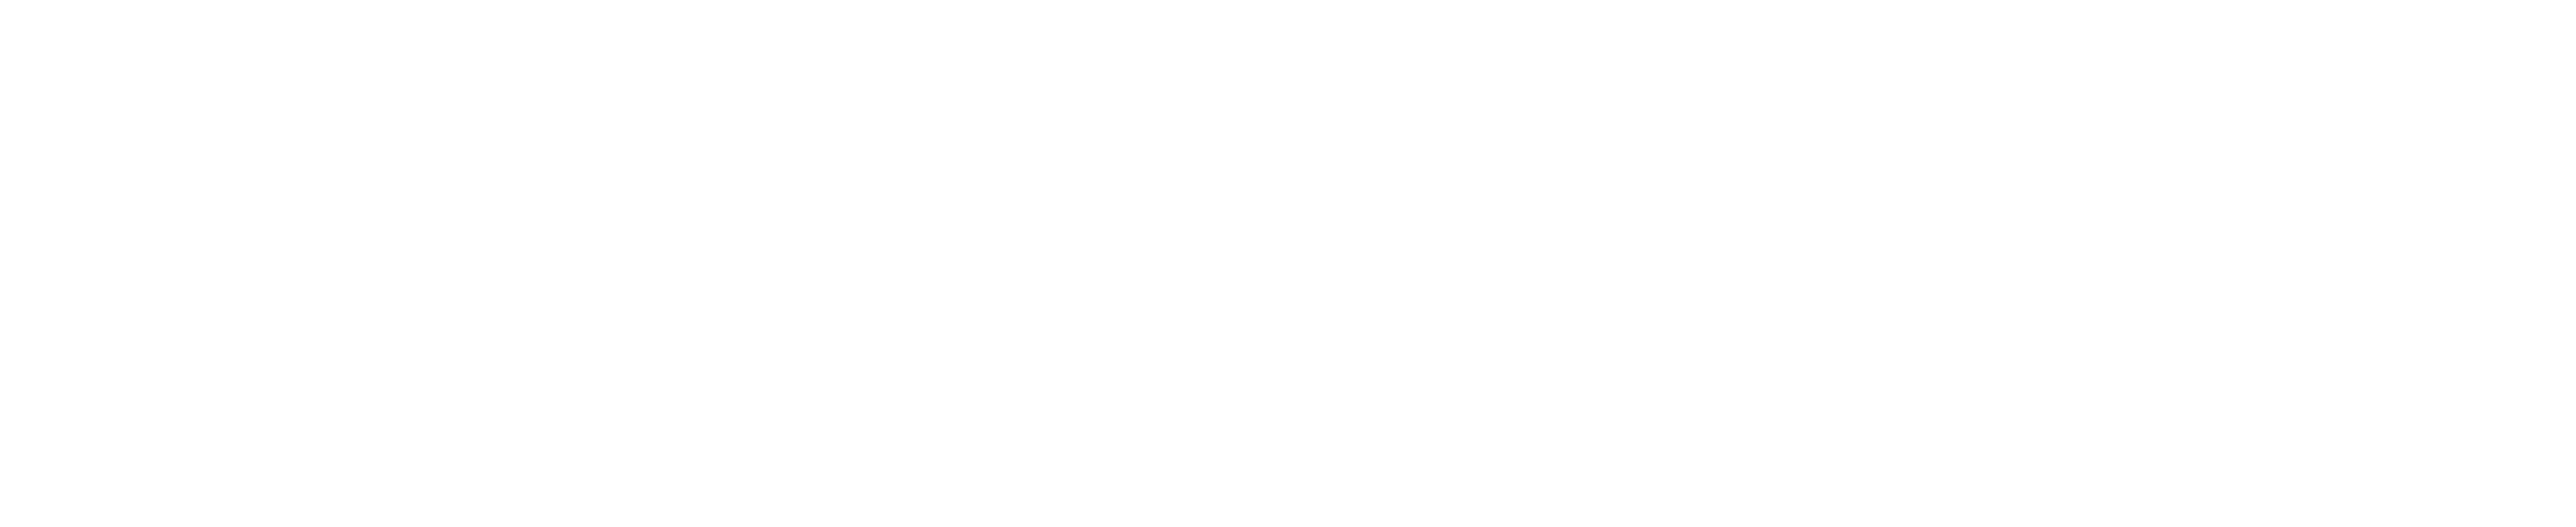 moon-travel logo